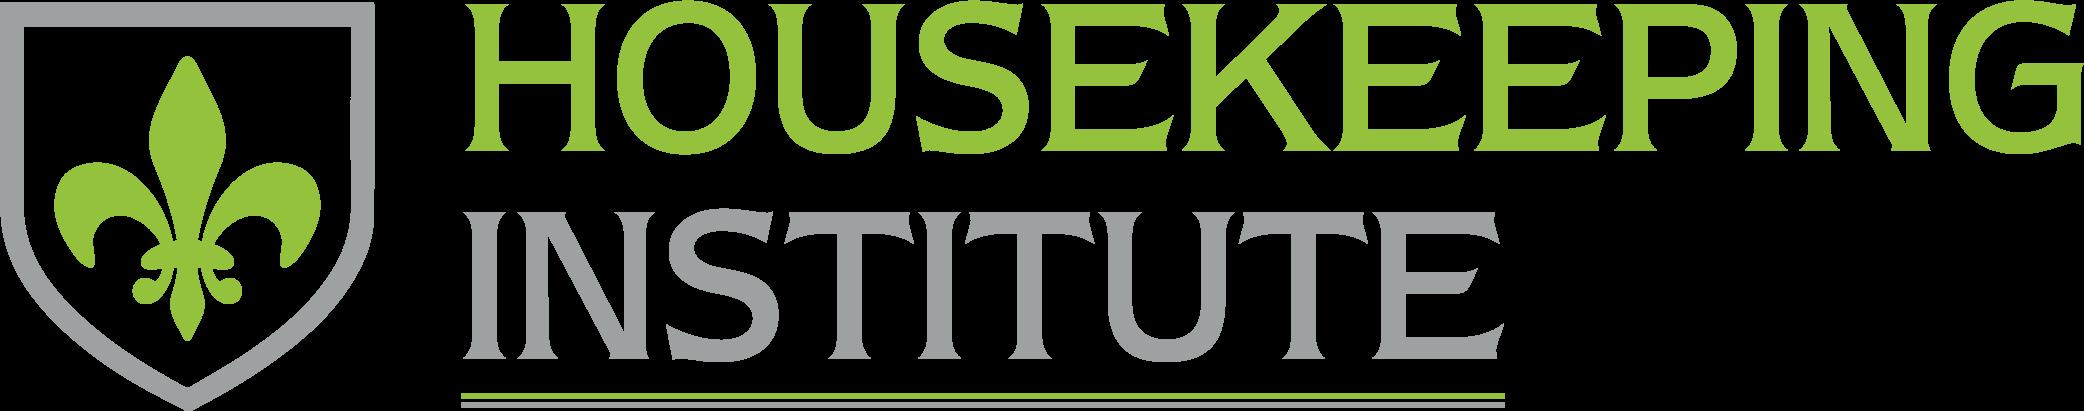 Houskeeping-Training-Logo